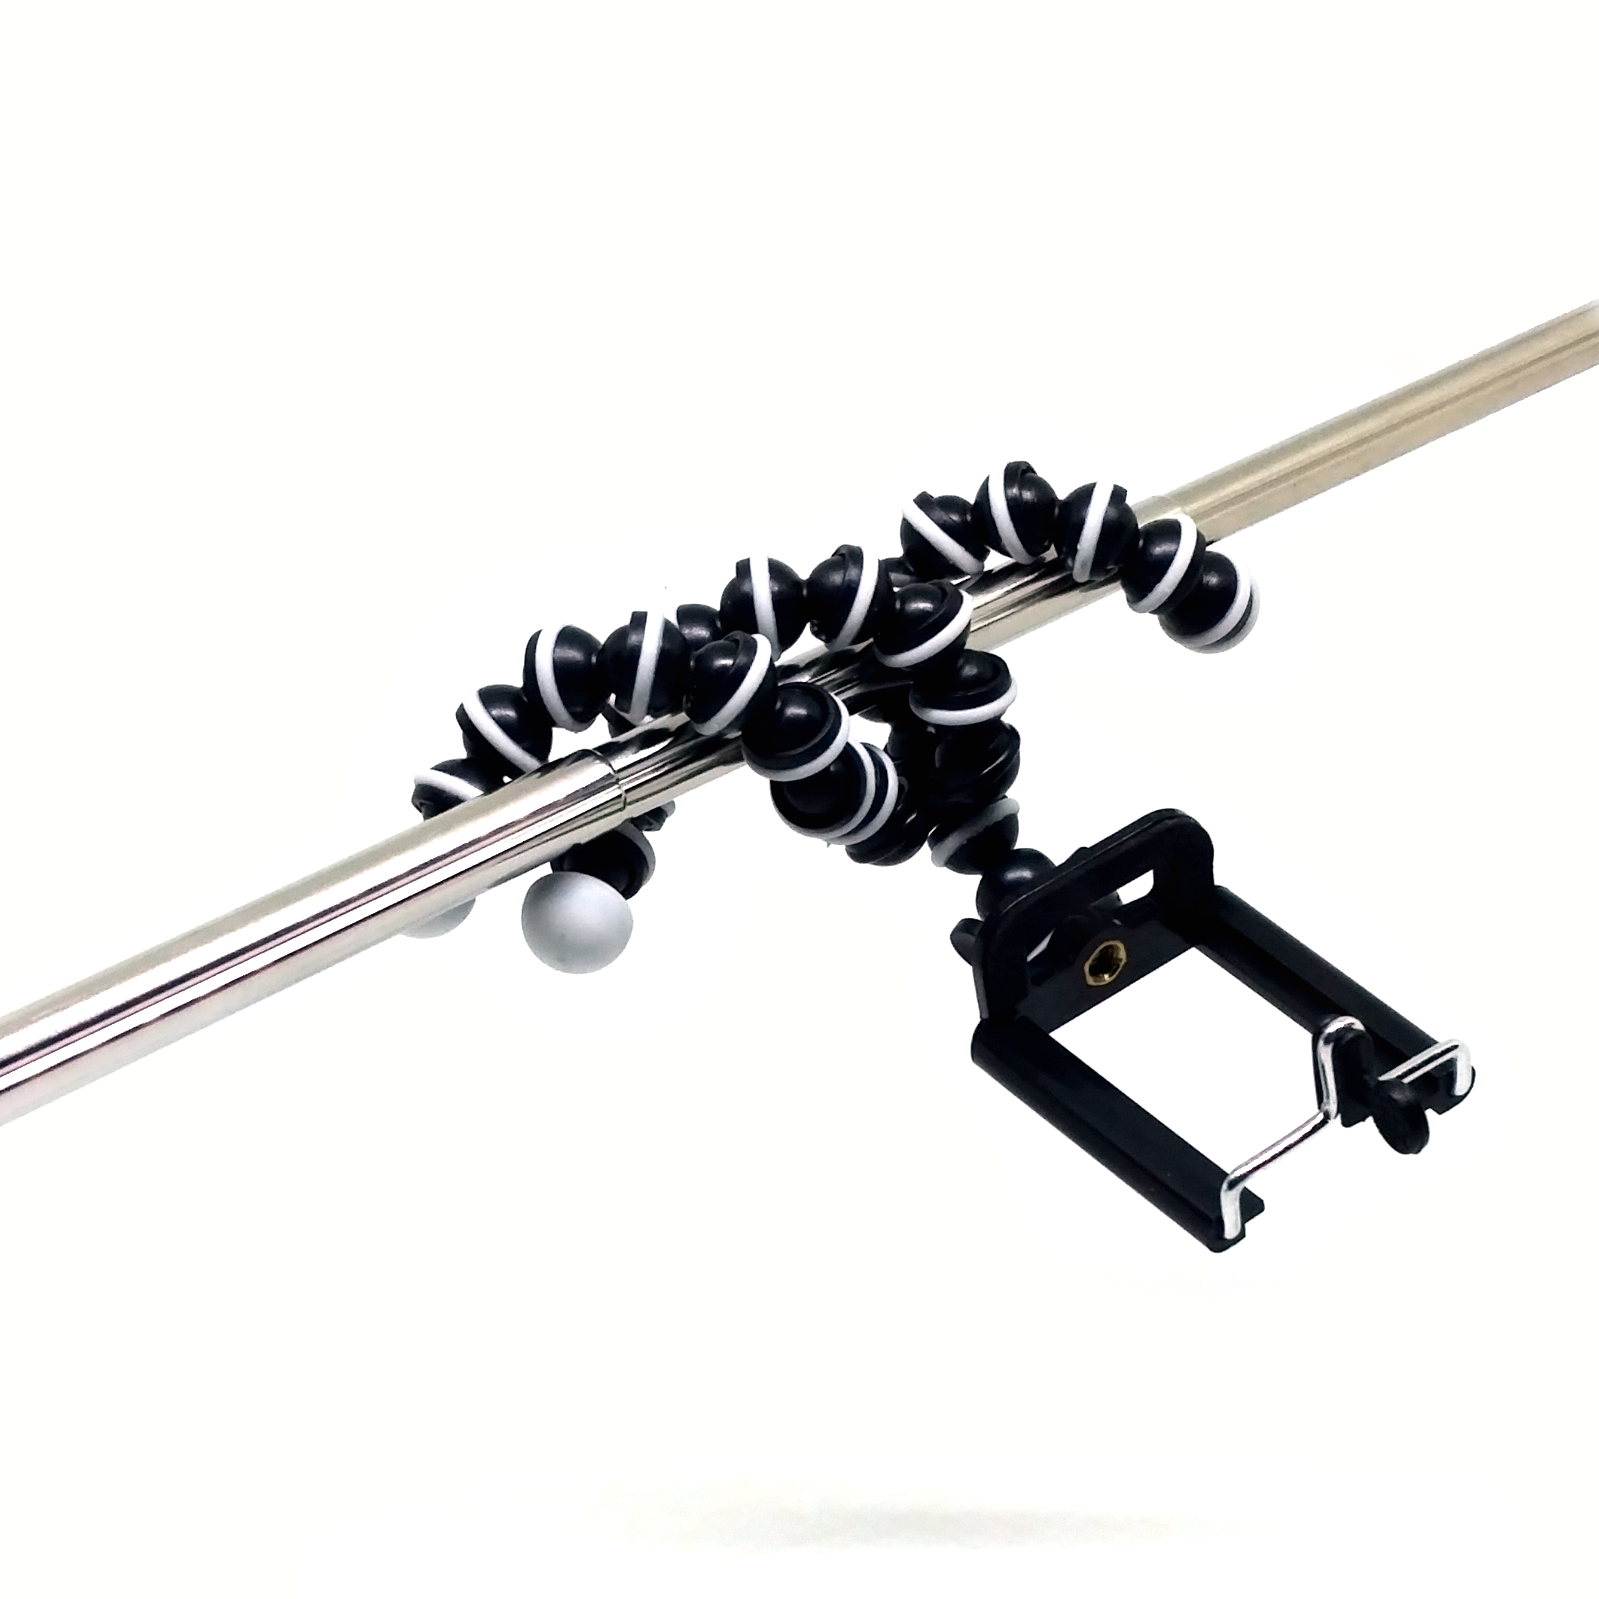 tripod-handphone-mounted